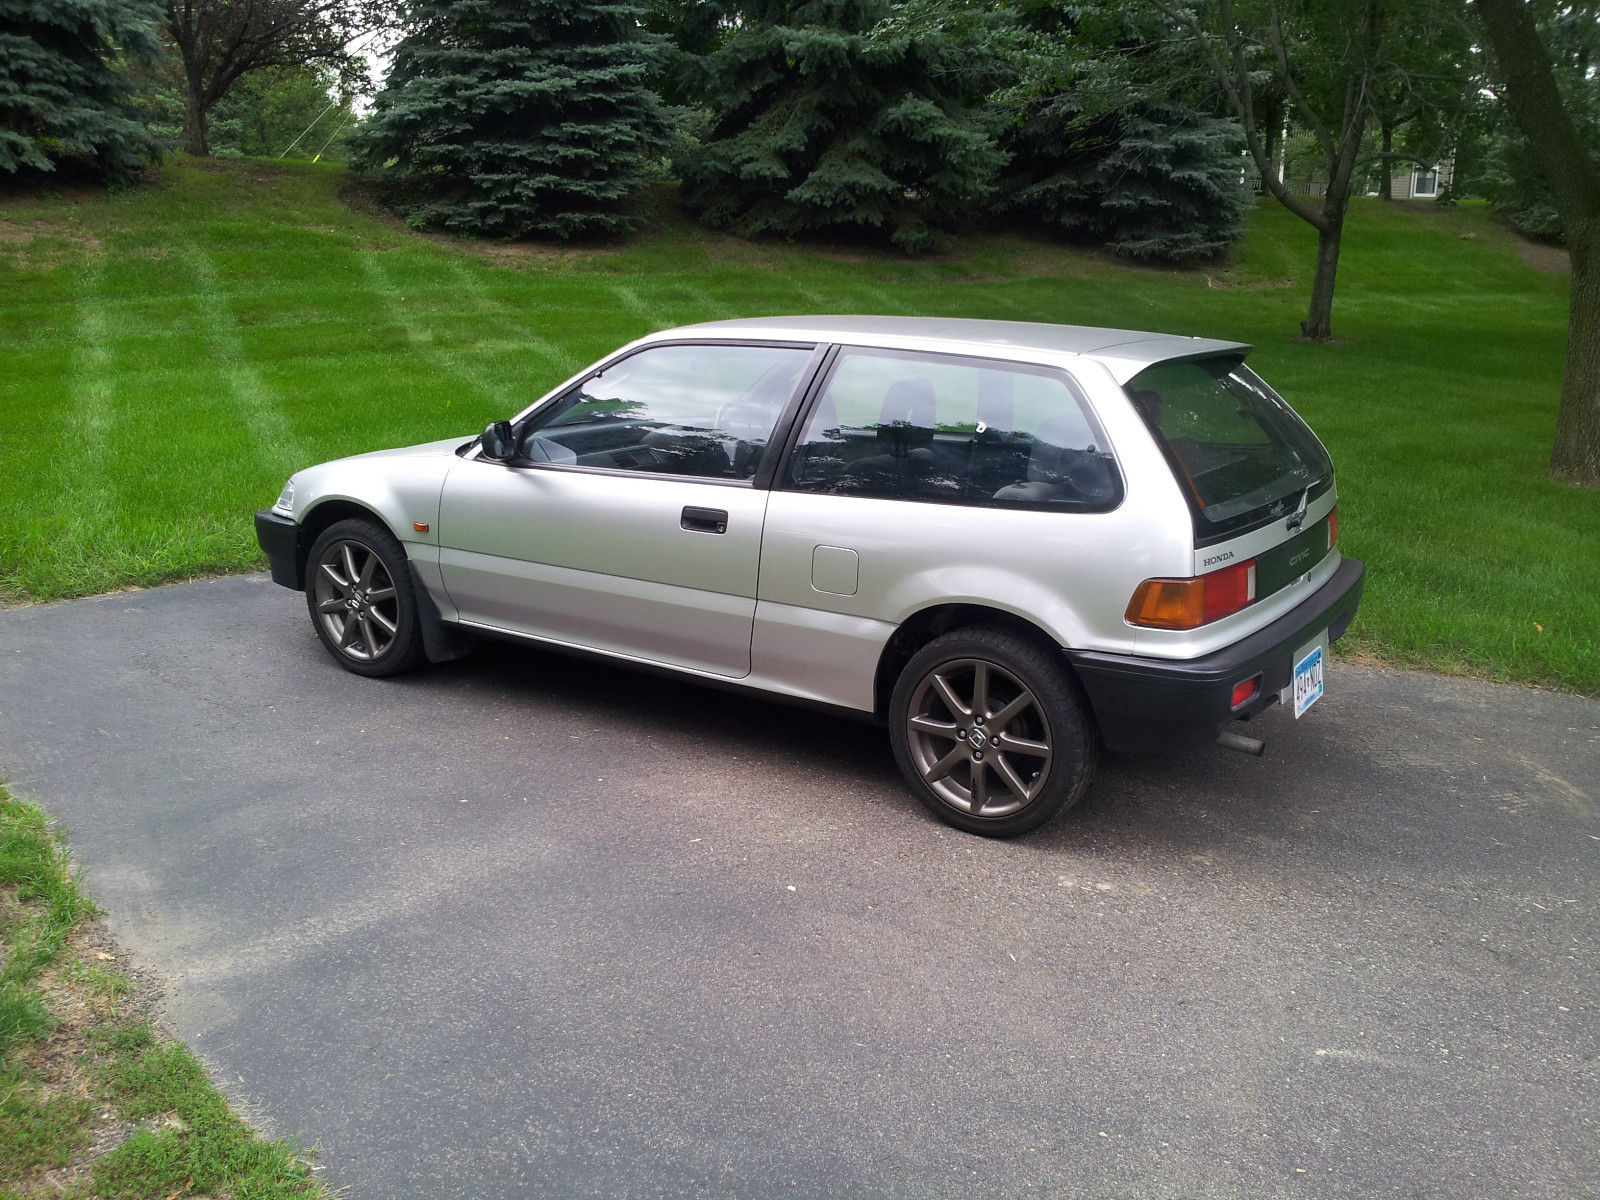 1988 honda civic rhd uk model classic honda civic 1988 for Honda civic 1988